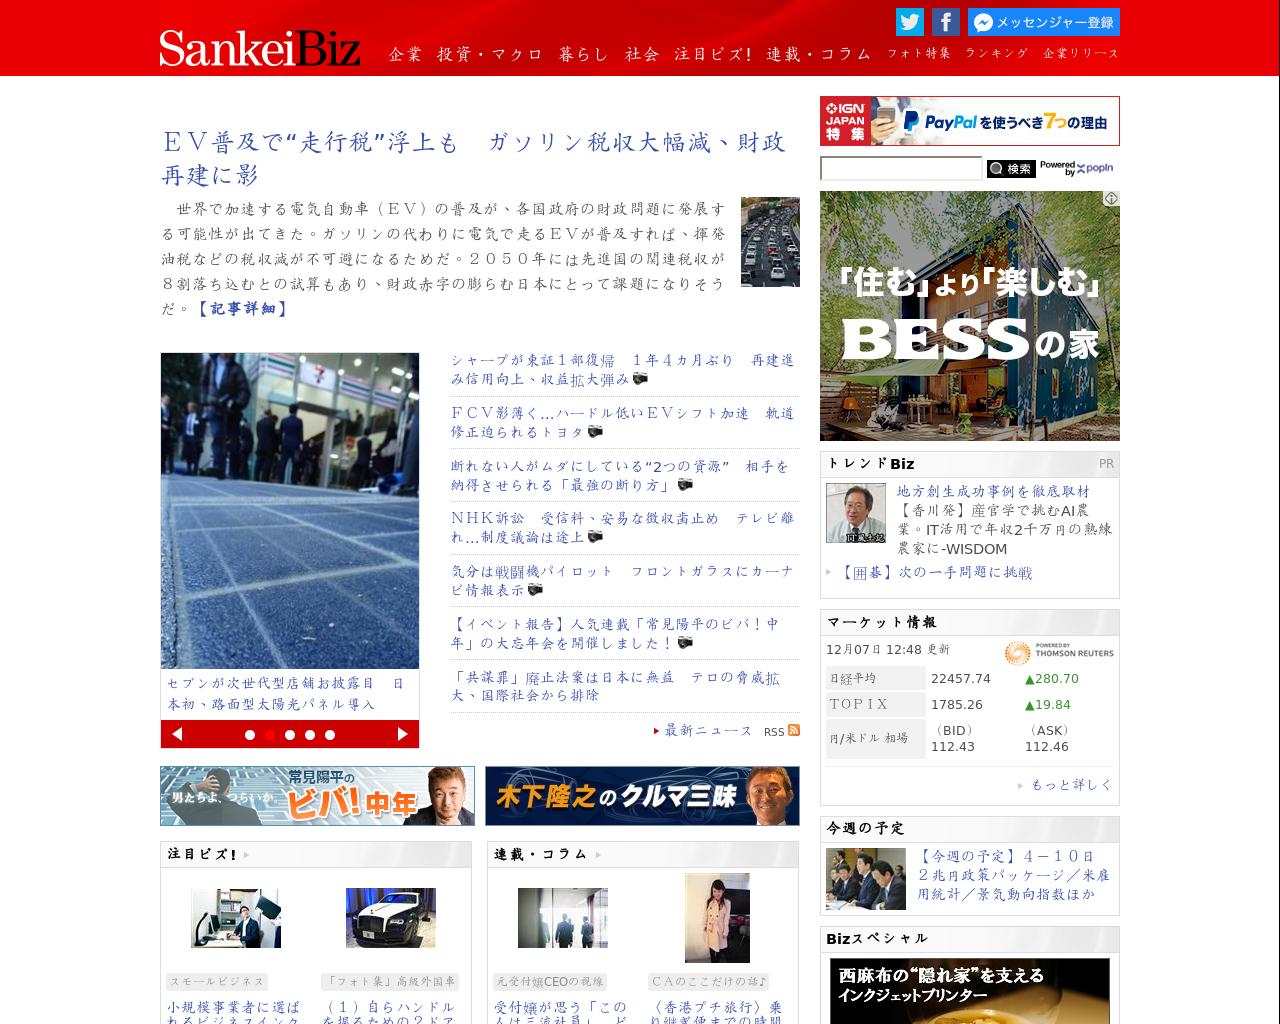 www.sankeibiz.jp(2017/12/06 22:51:00)